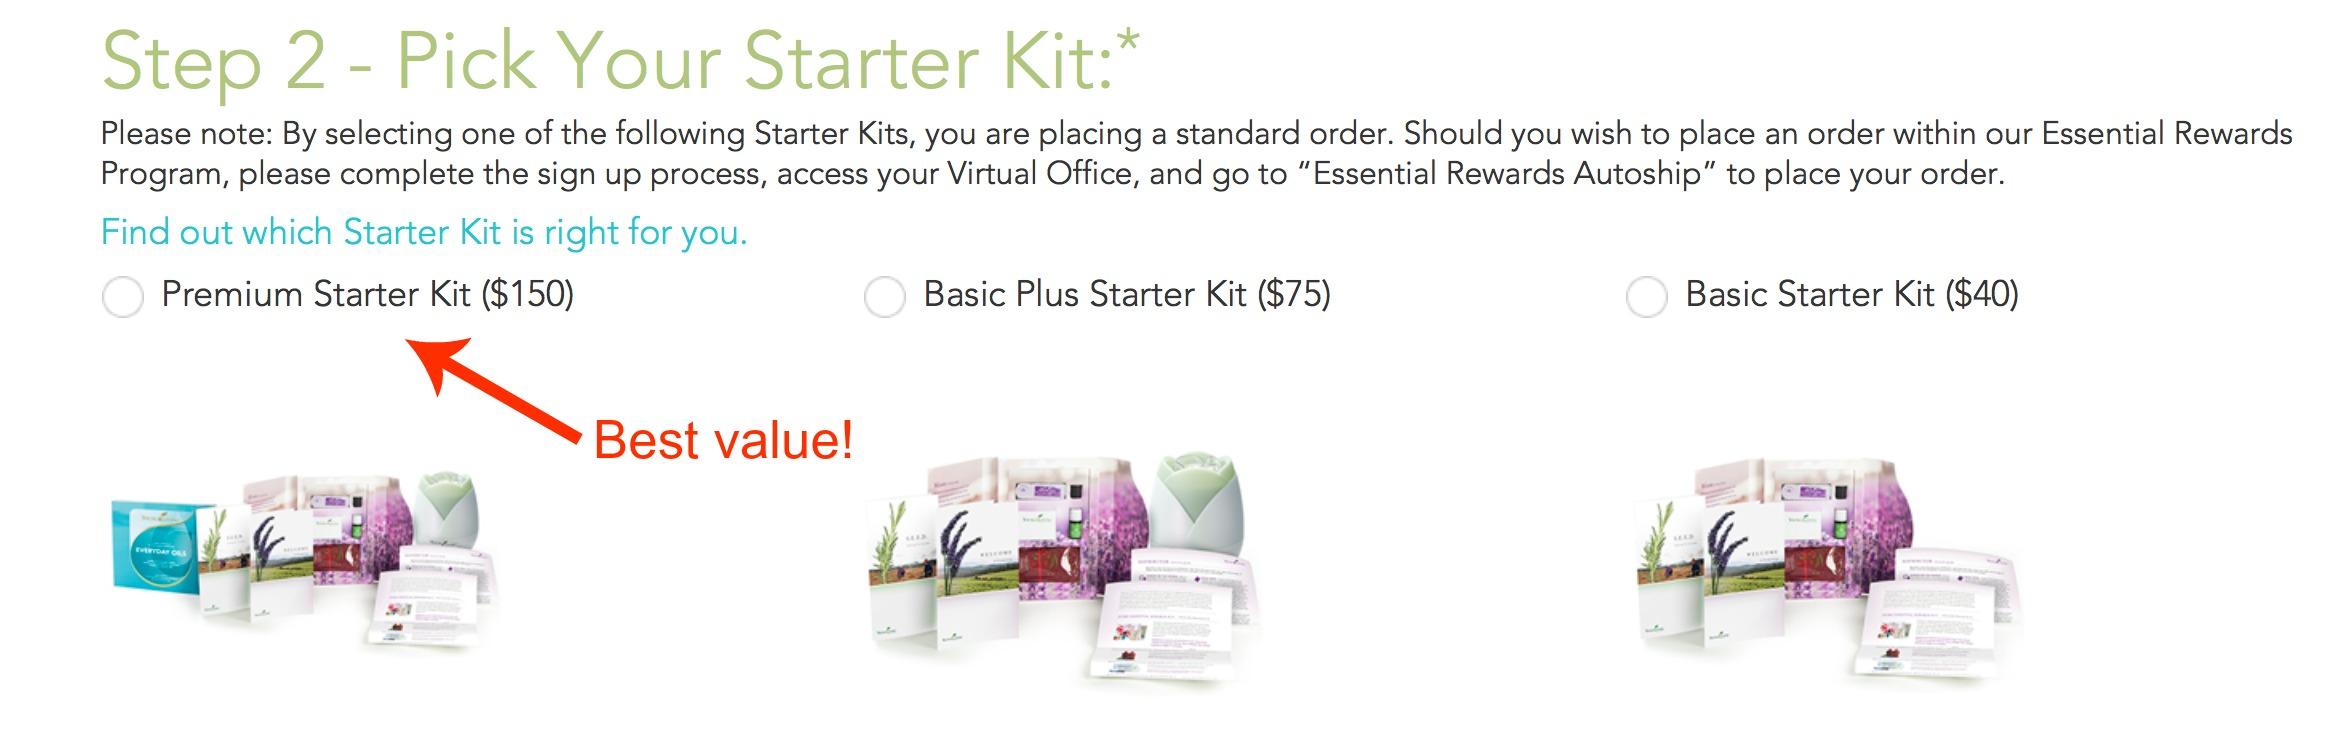 step 2 premium starter kit_